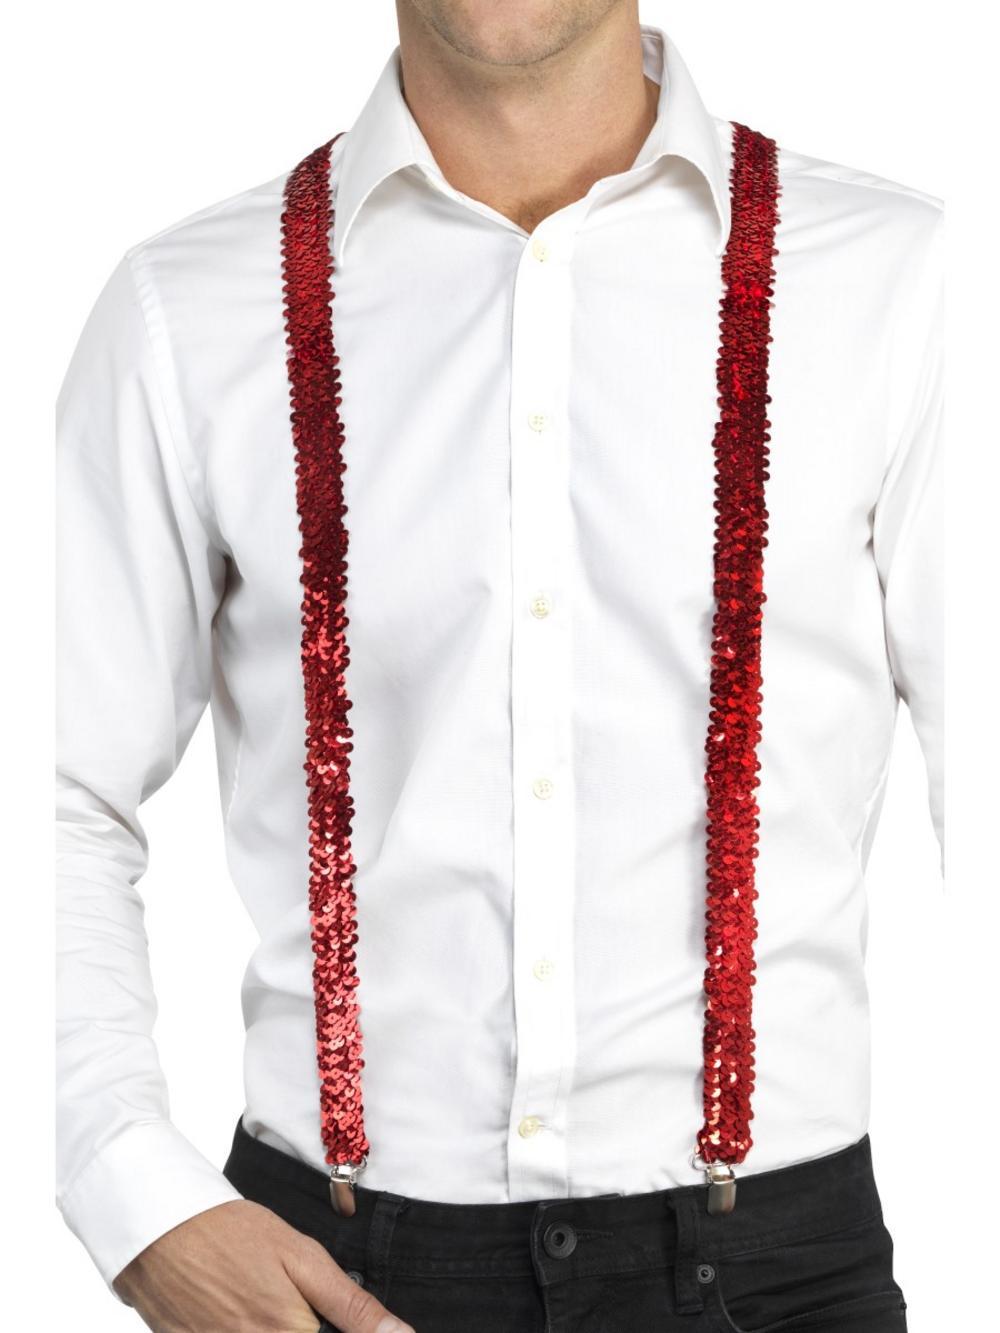 Sequin Braces Red